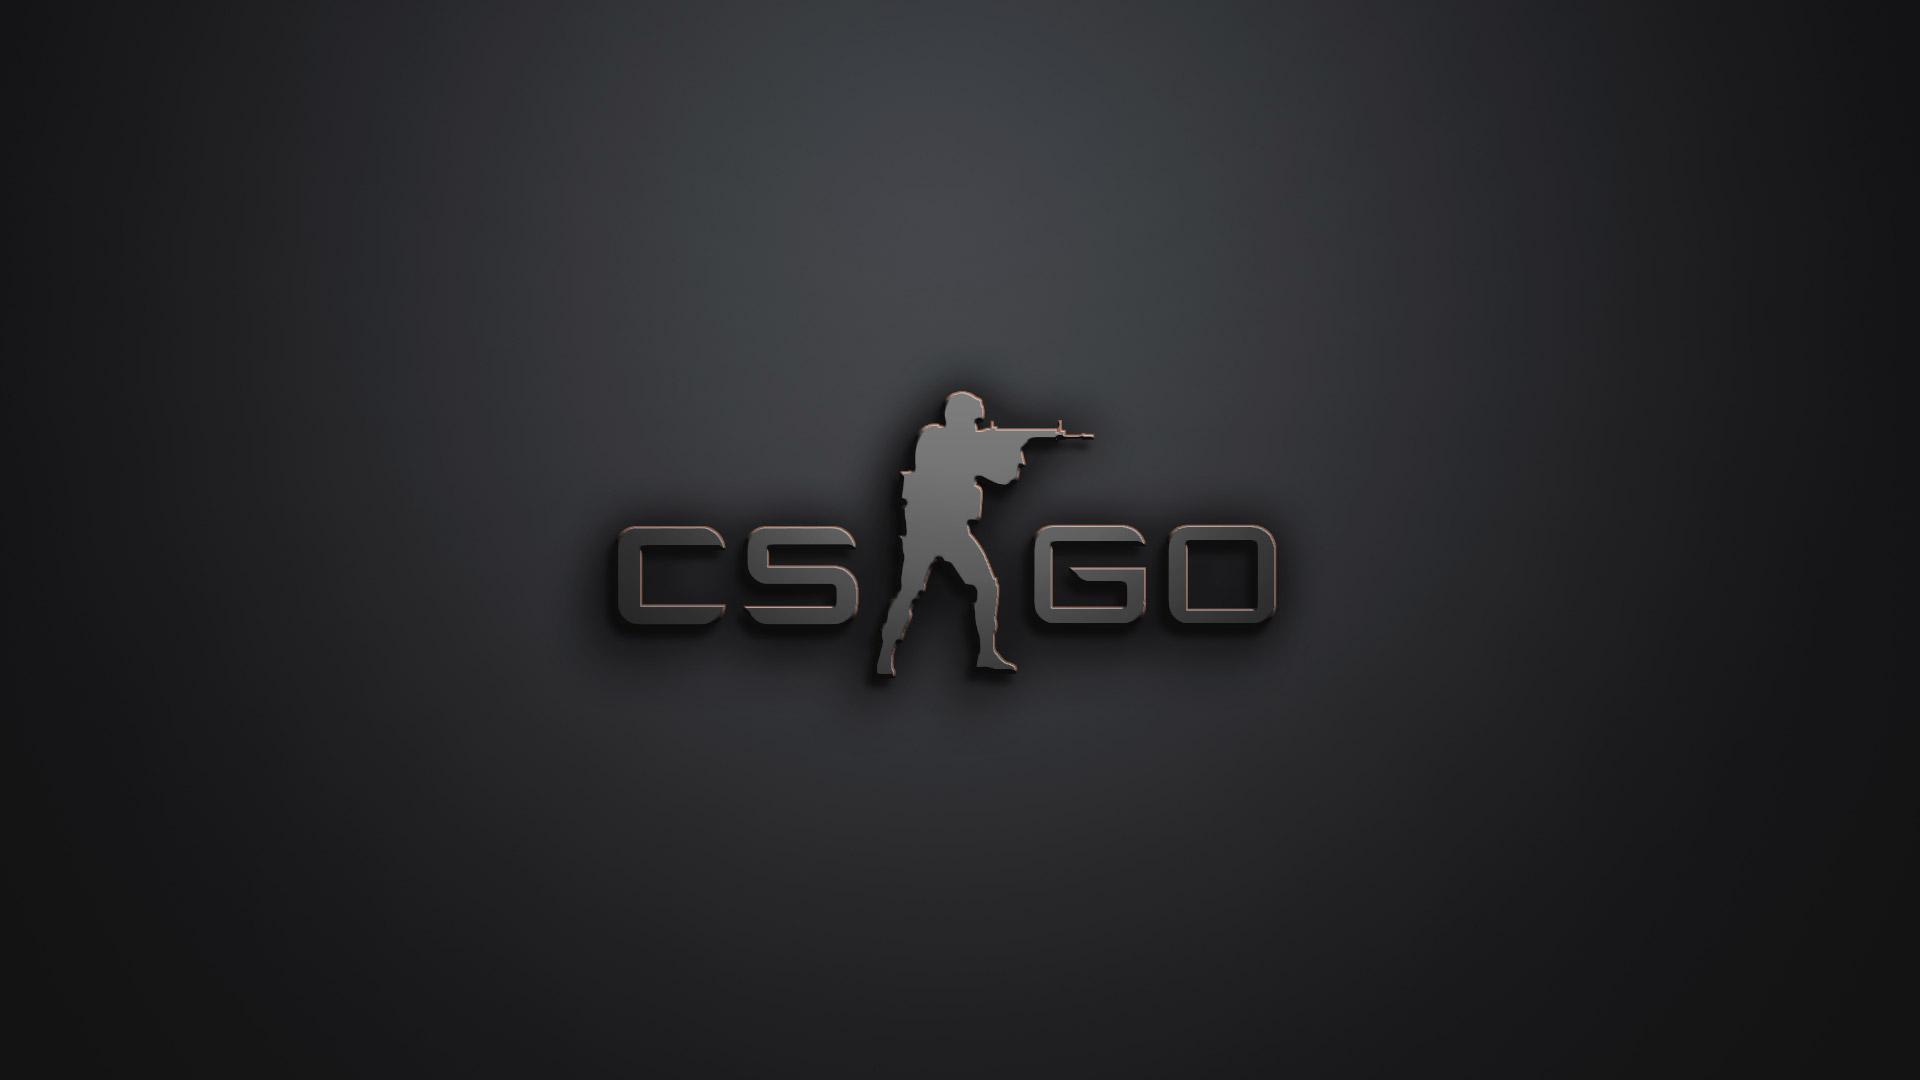 CSGO 移植武装突袭OL地图de_sa_supplybase